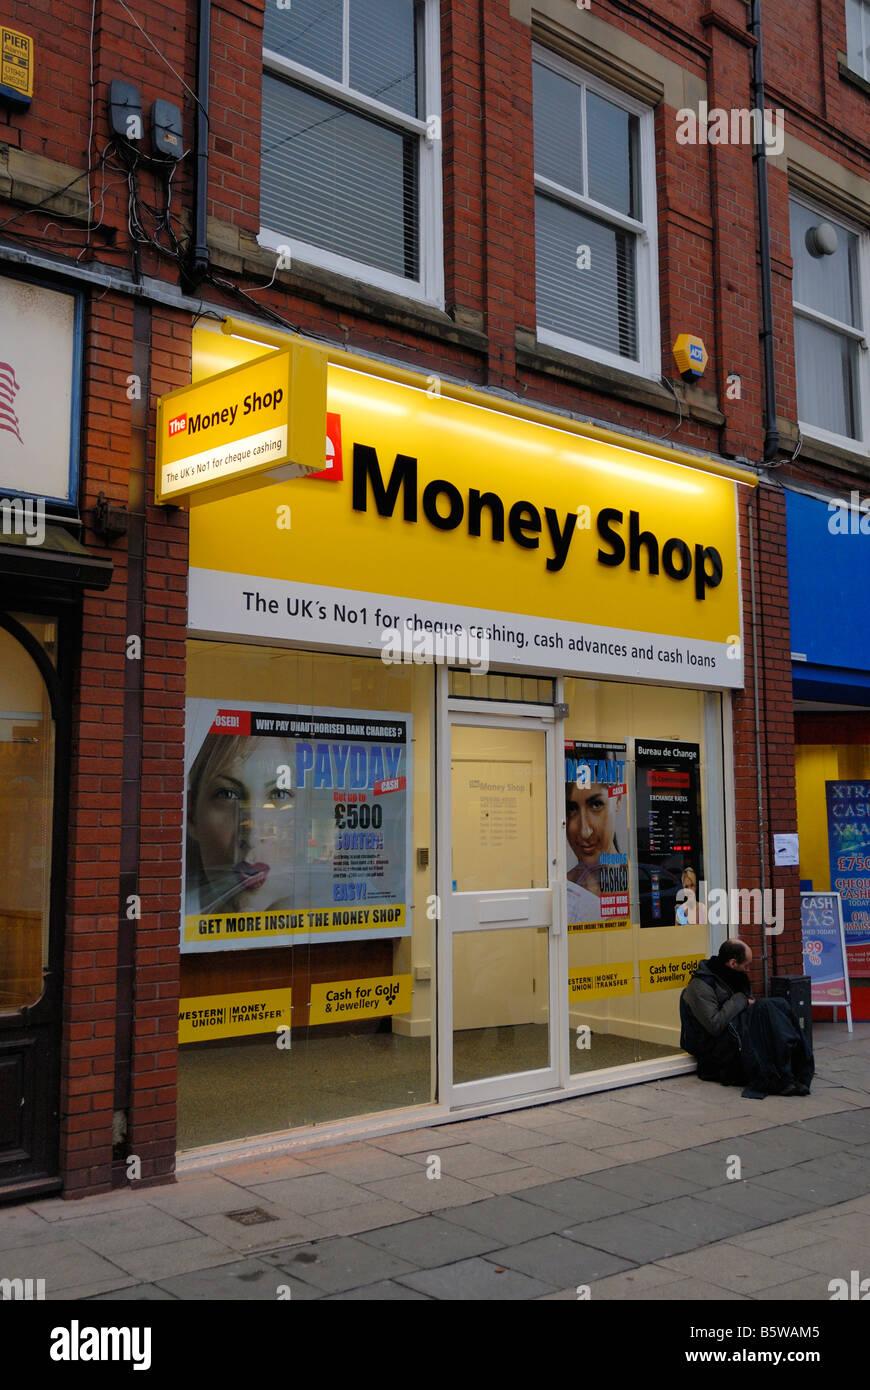 24 plus advanced loans image 5